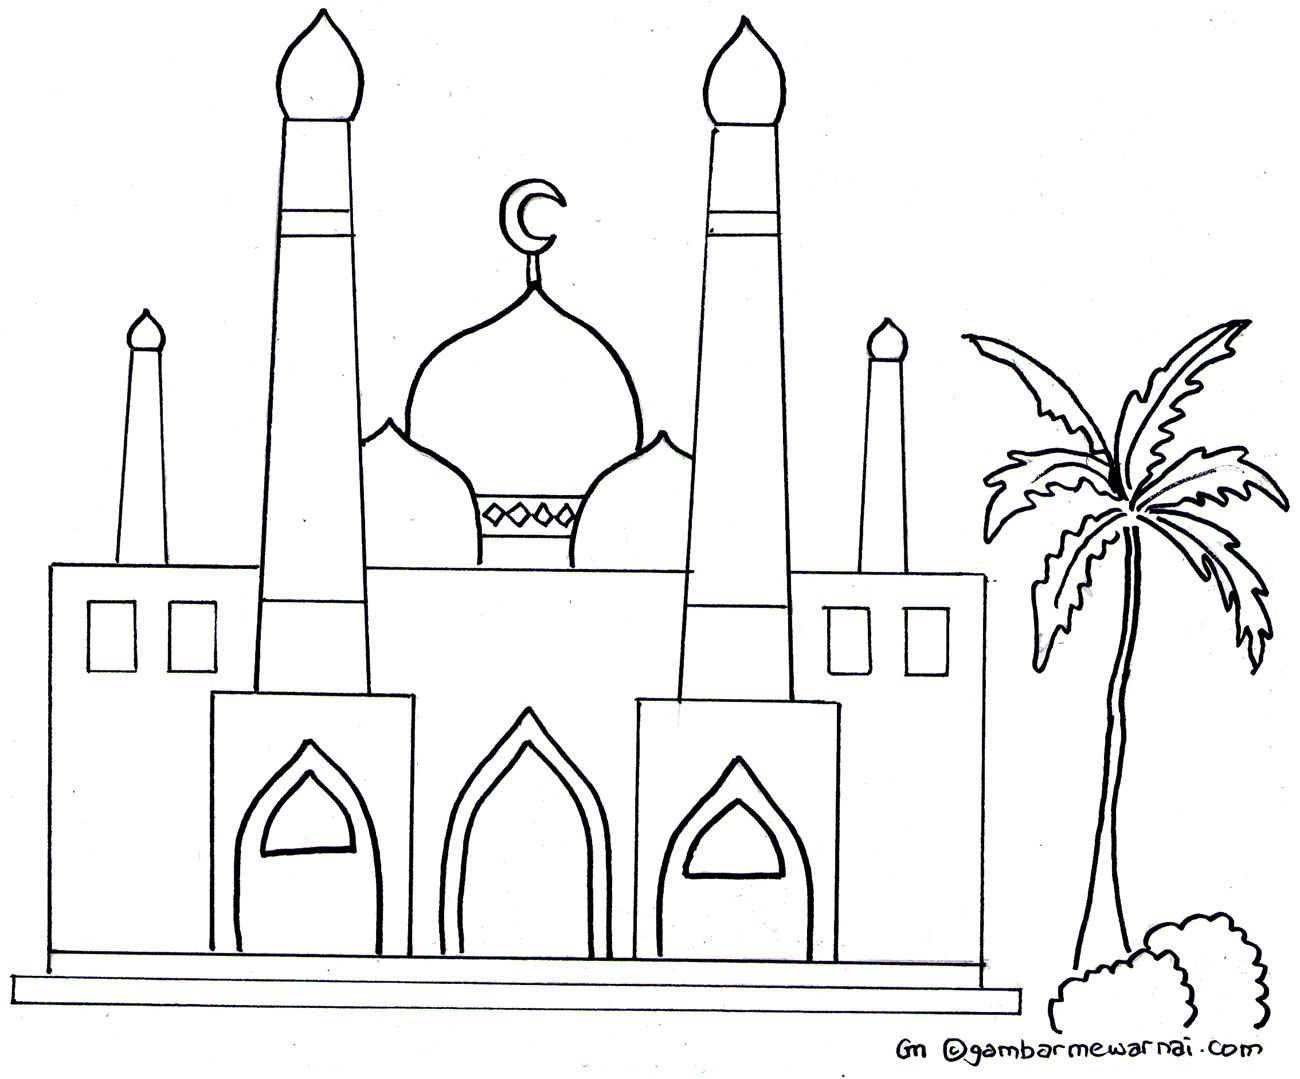 Gambar Mewarnai Masjid  Kaligrafi  Gambar Warna dan